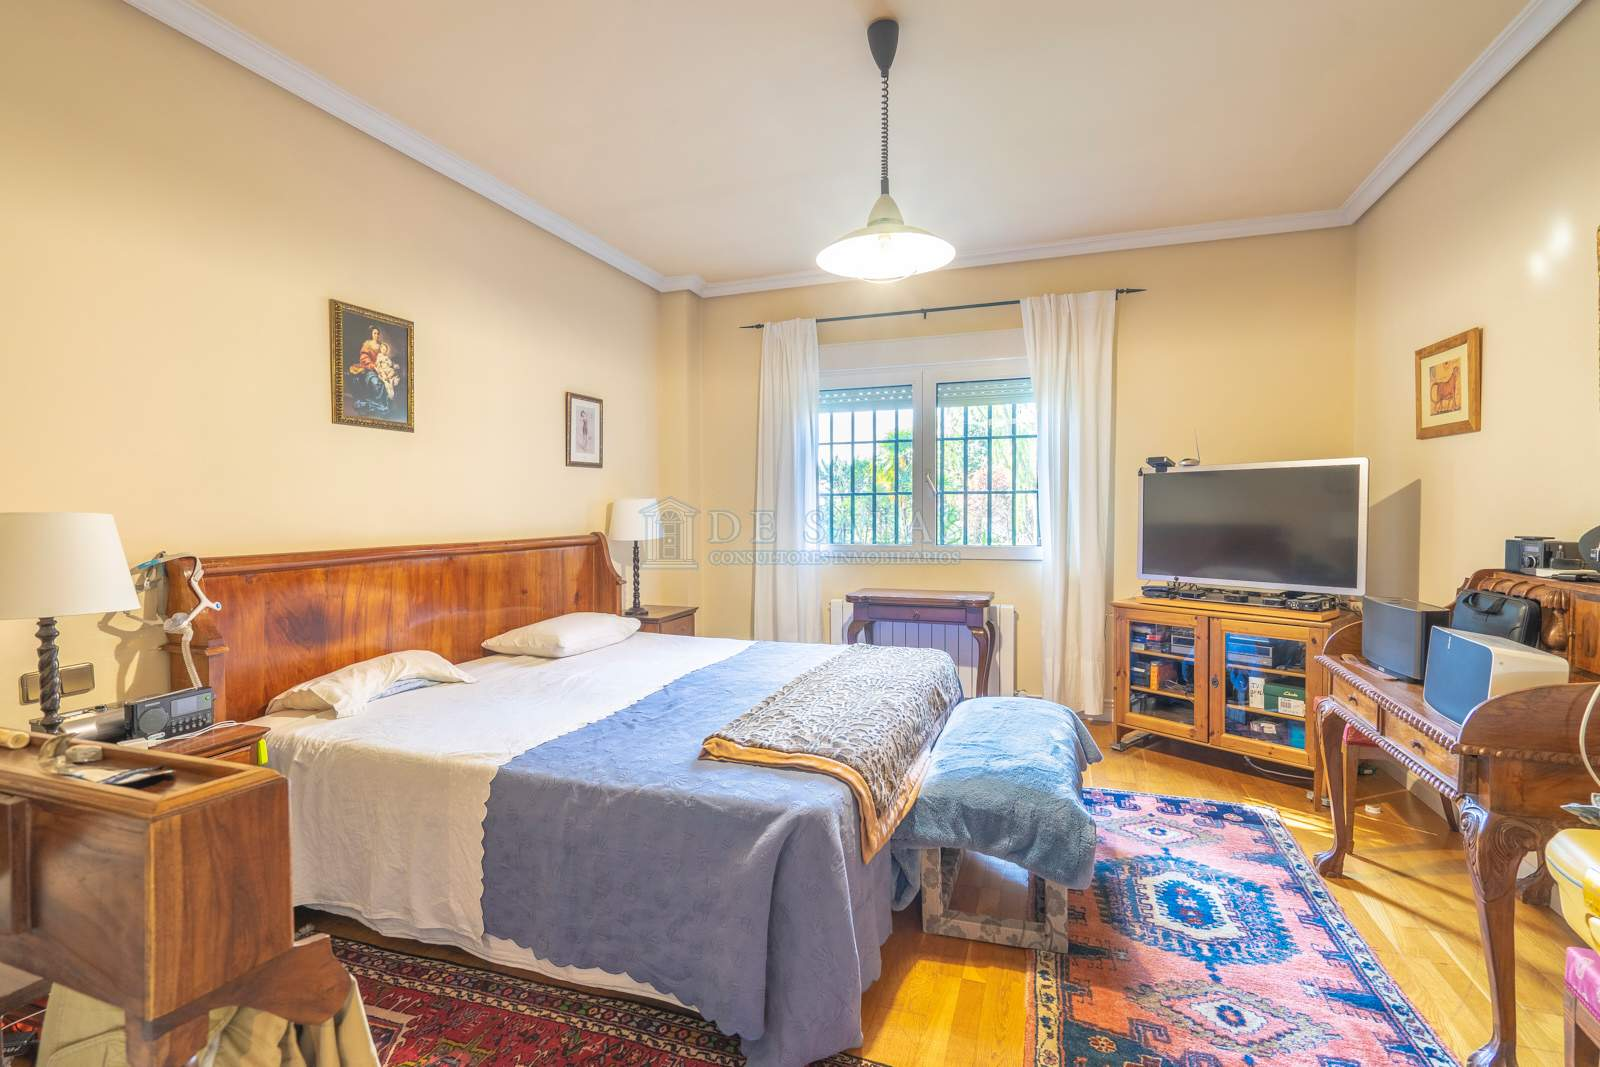 26-Dormitorio Chalet La Moraleja